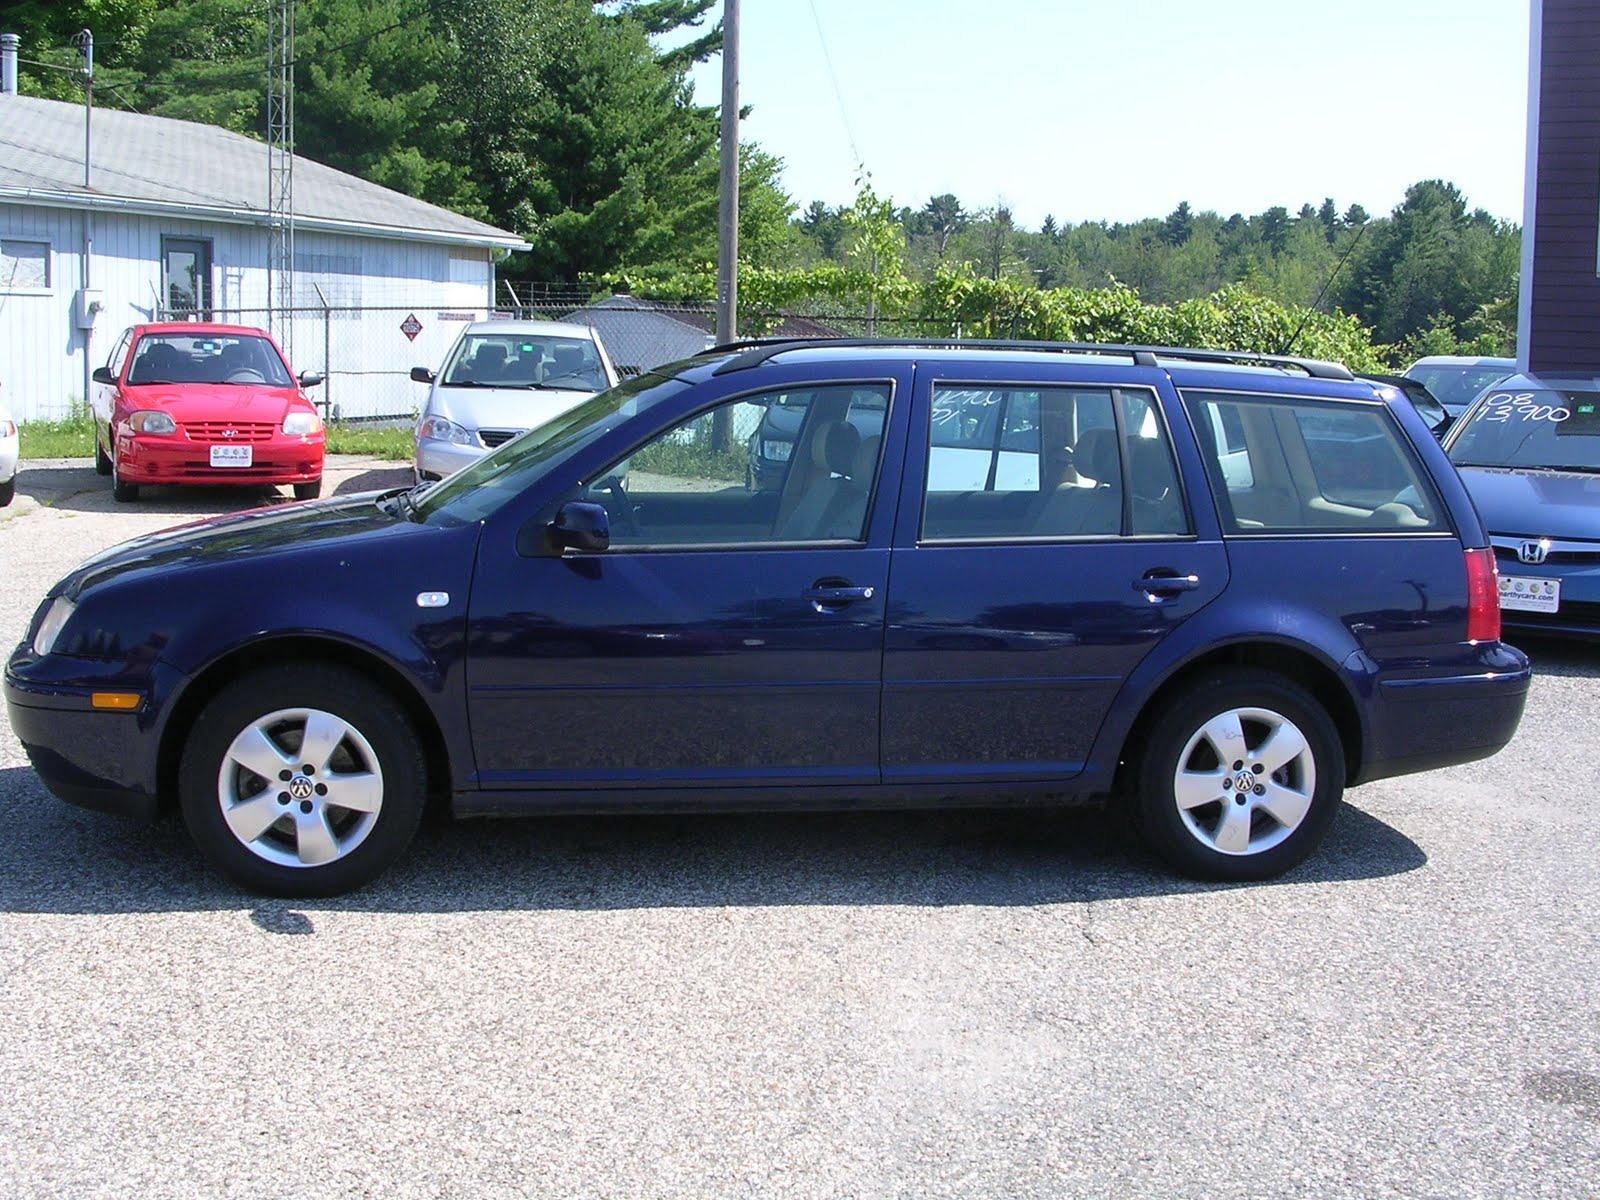 2003 volkswagen jetta gl tdi station wagon blue 168963 mi 10 900 http ht ly 5bmsk compact 4 spd automatic mpg 29 40